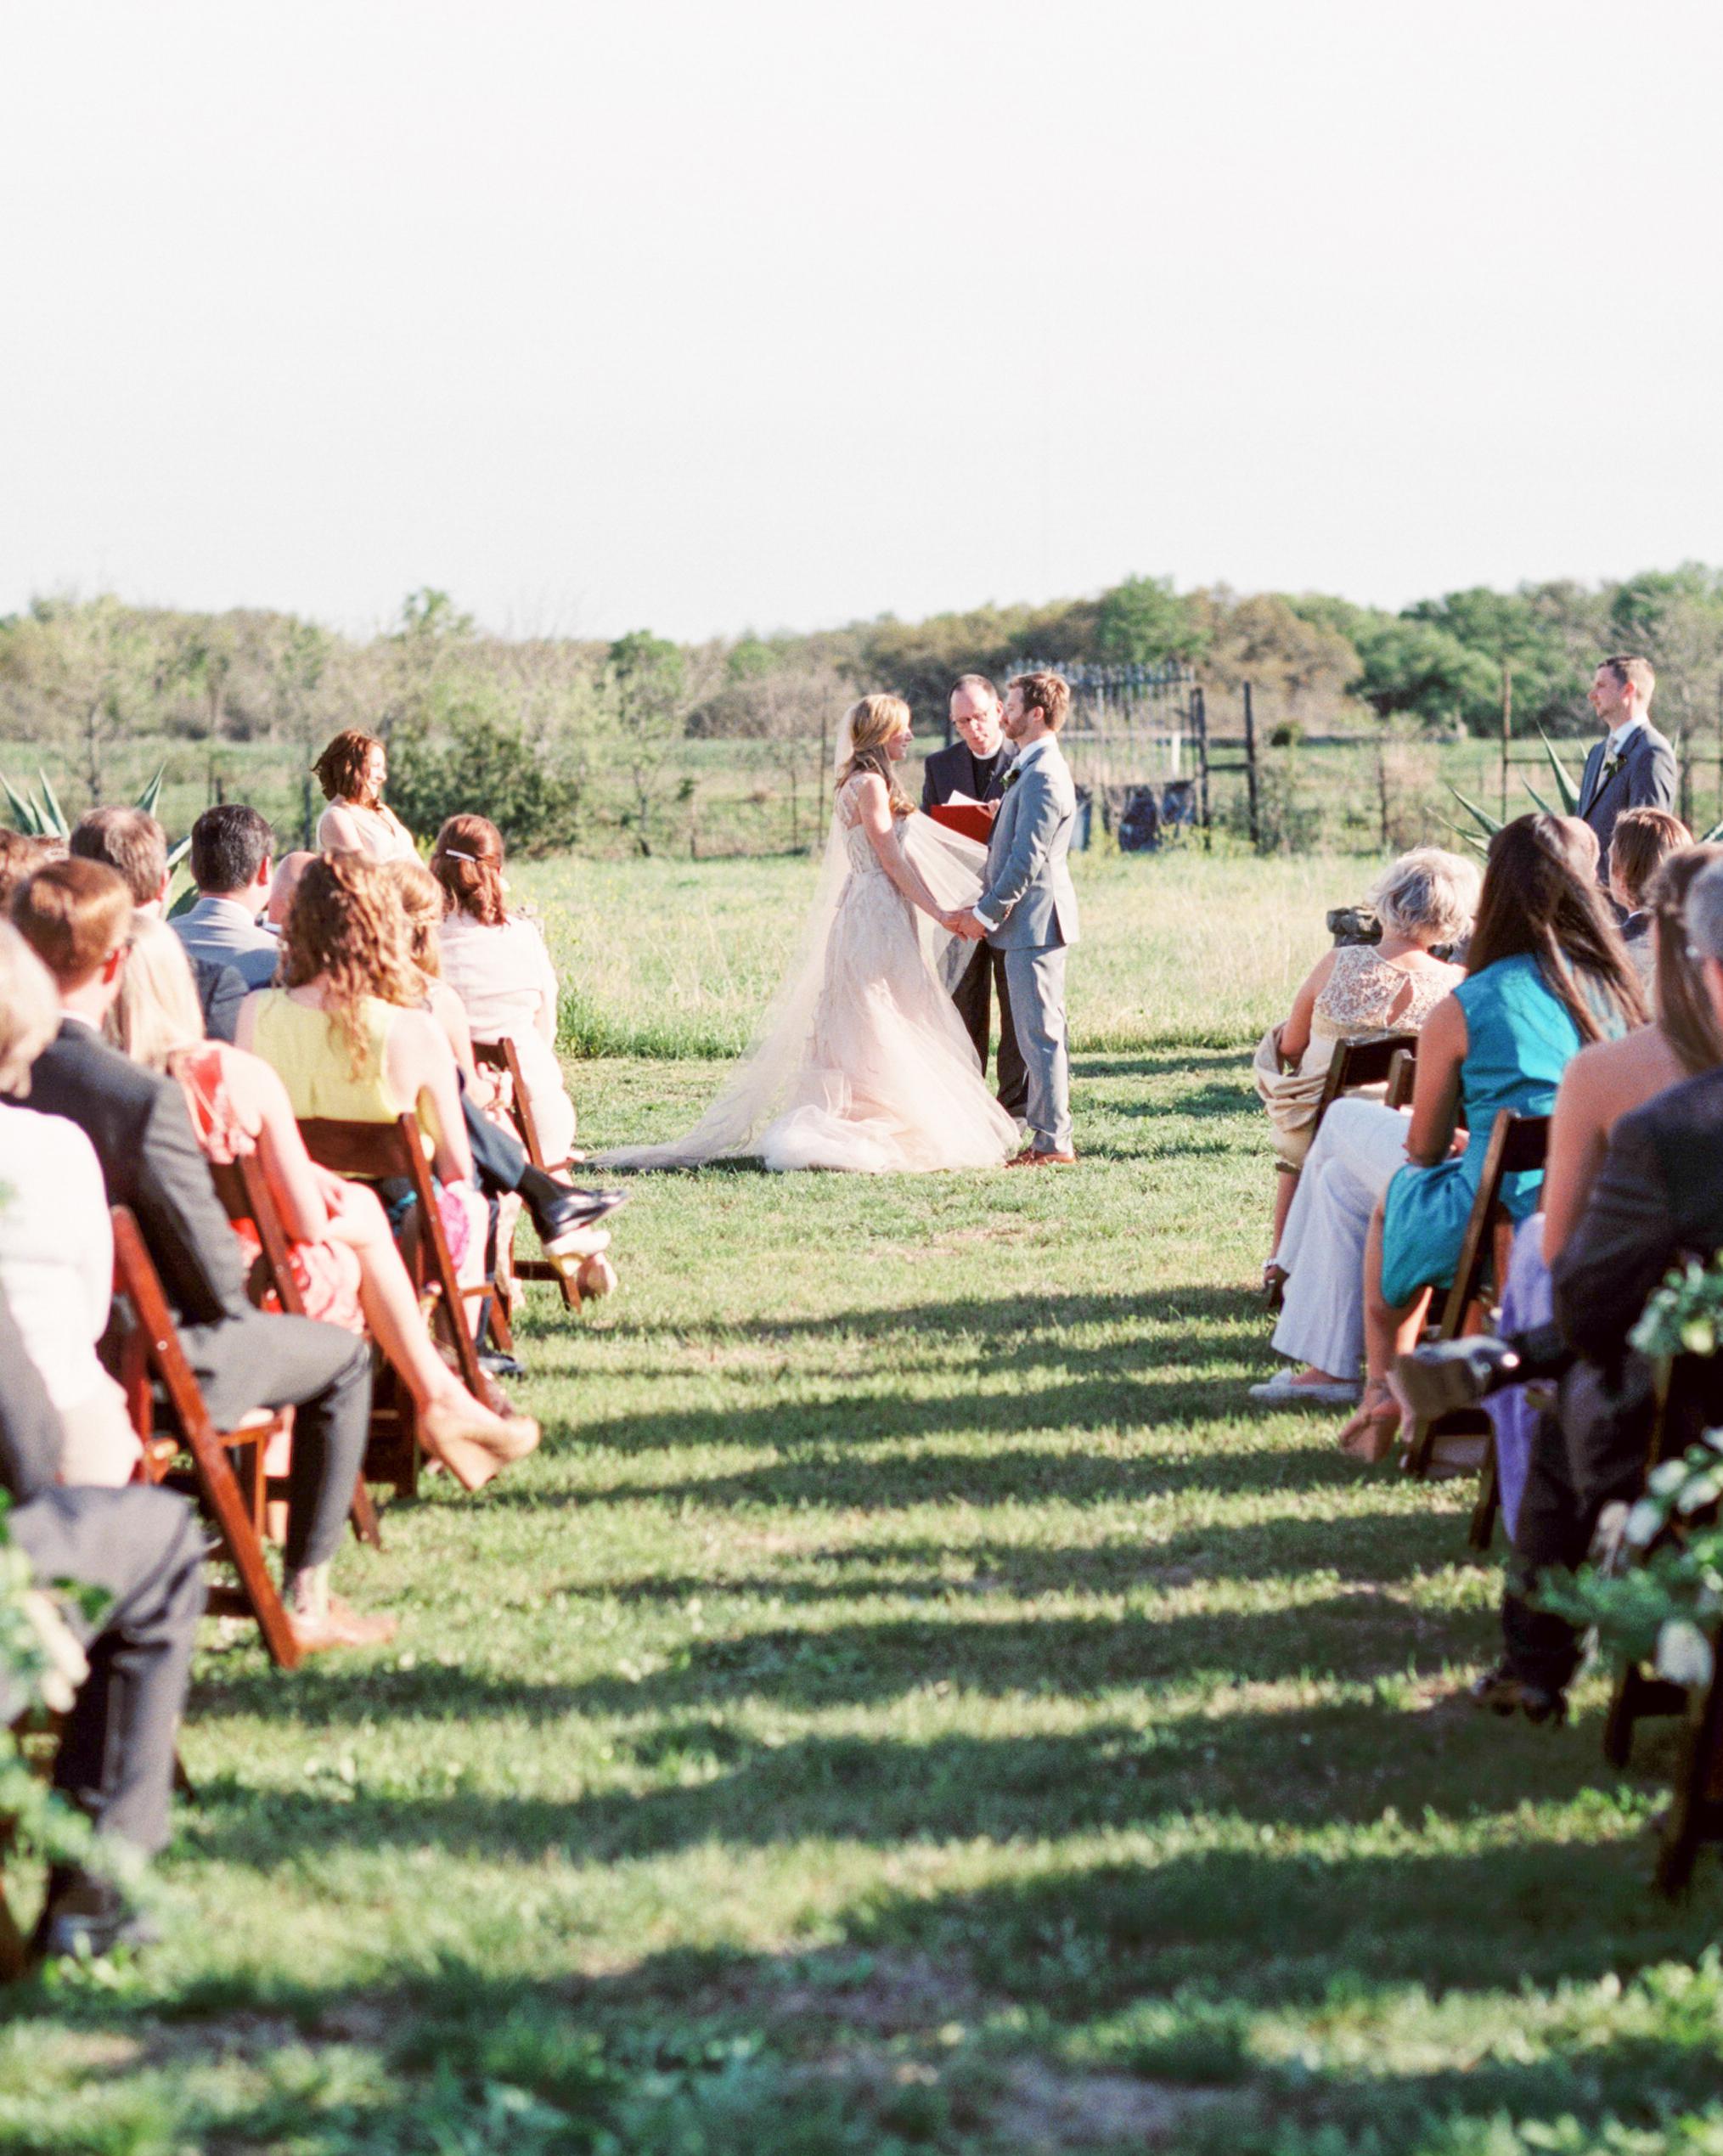 paige-chris-wedding-suite-078-s111485-0914.jpg